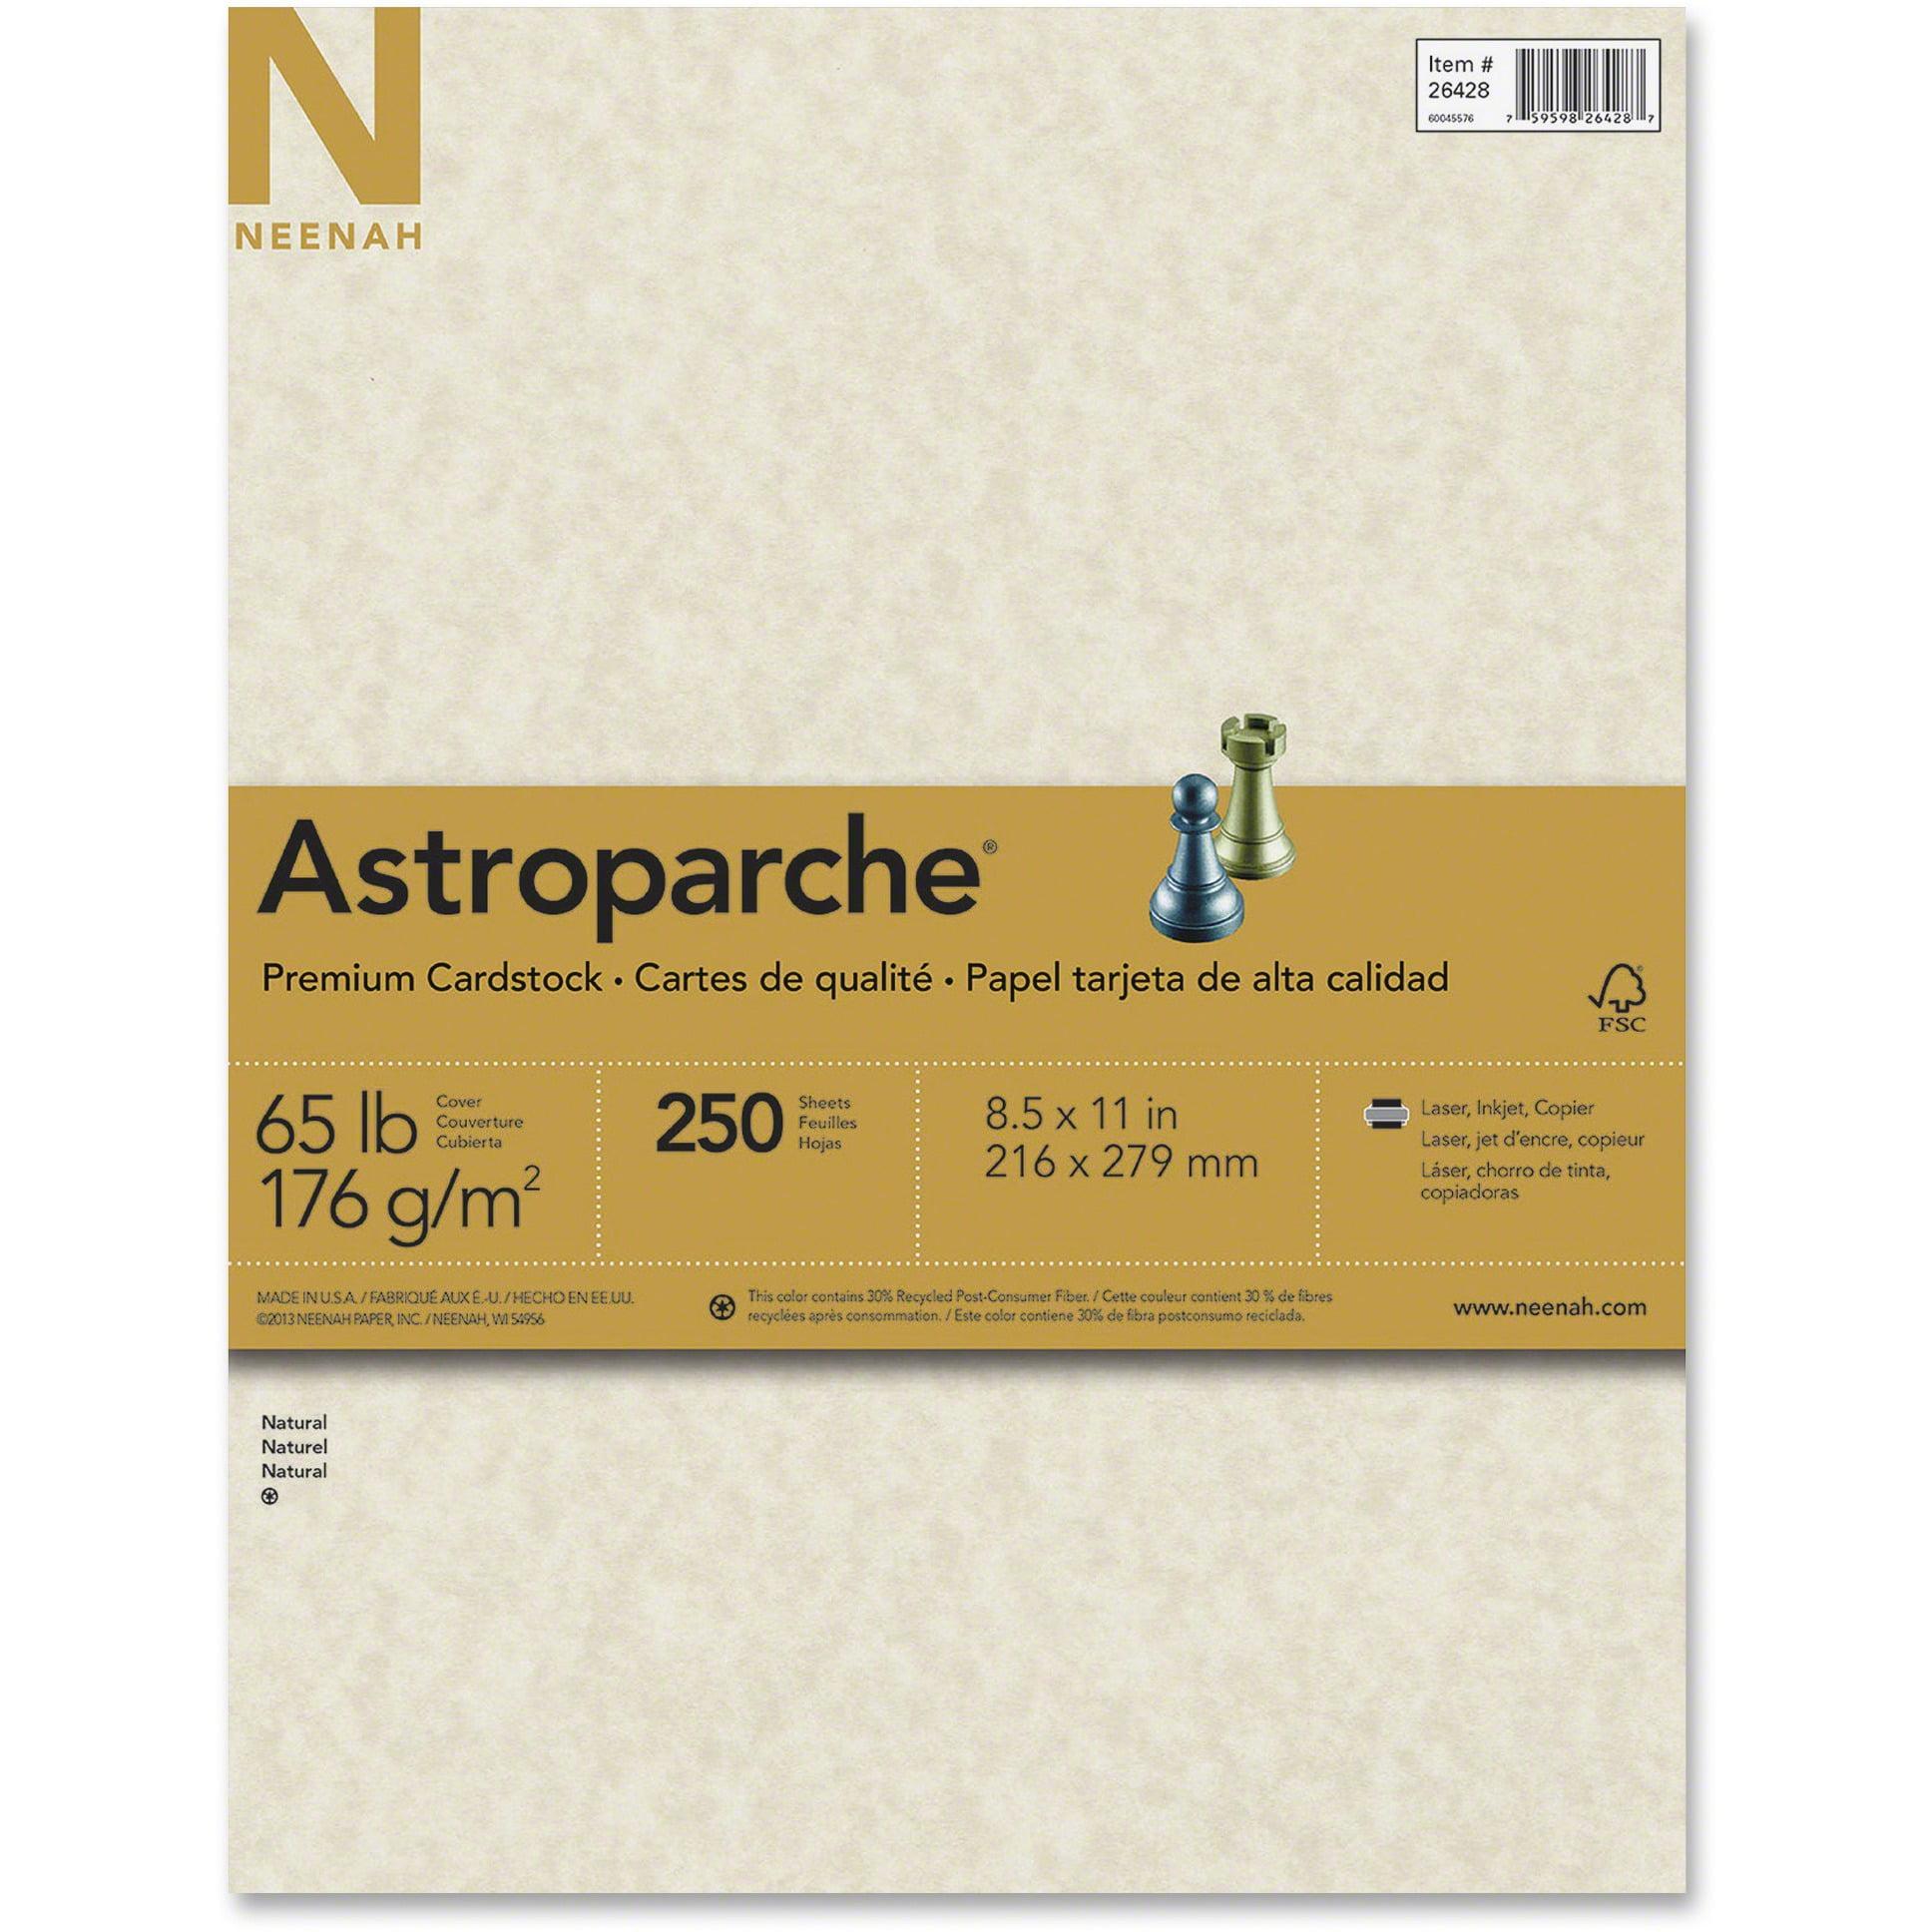 Astrobrights, WAU26428, Premium Cardstock, 250 / Pack, Natural